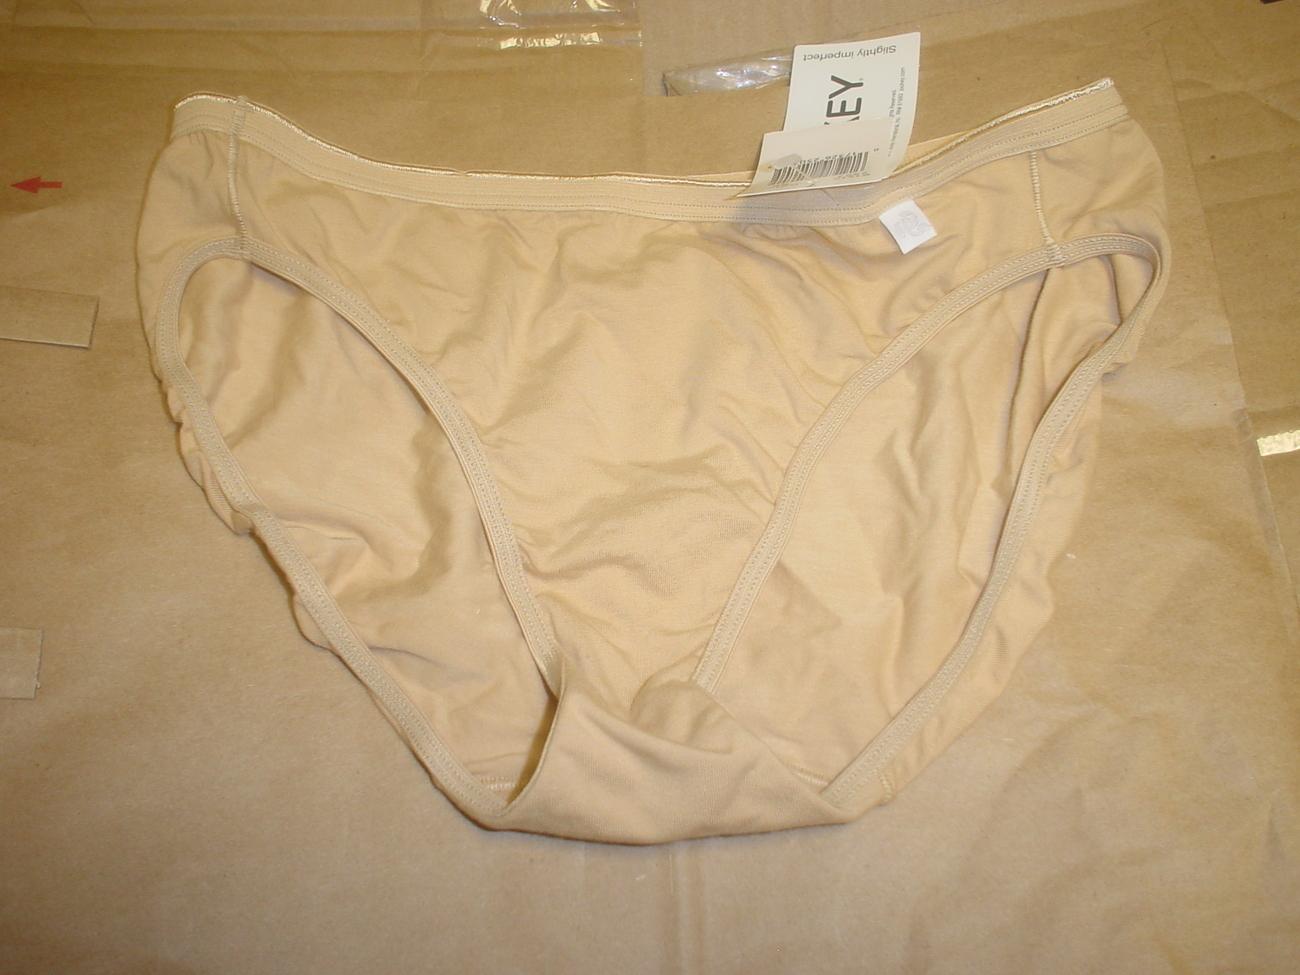 Jockey Panty 6/Medium or 7/Large Buff SP-Slightly Imperfect Lot of 2 NWOT